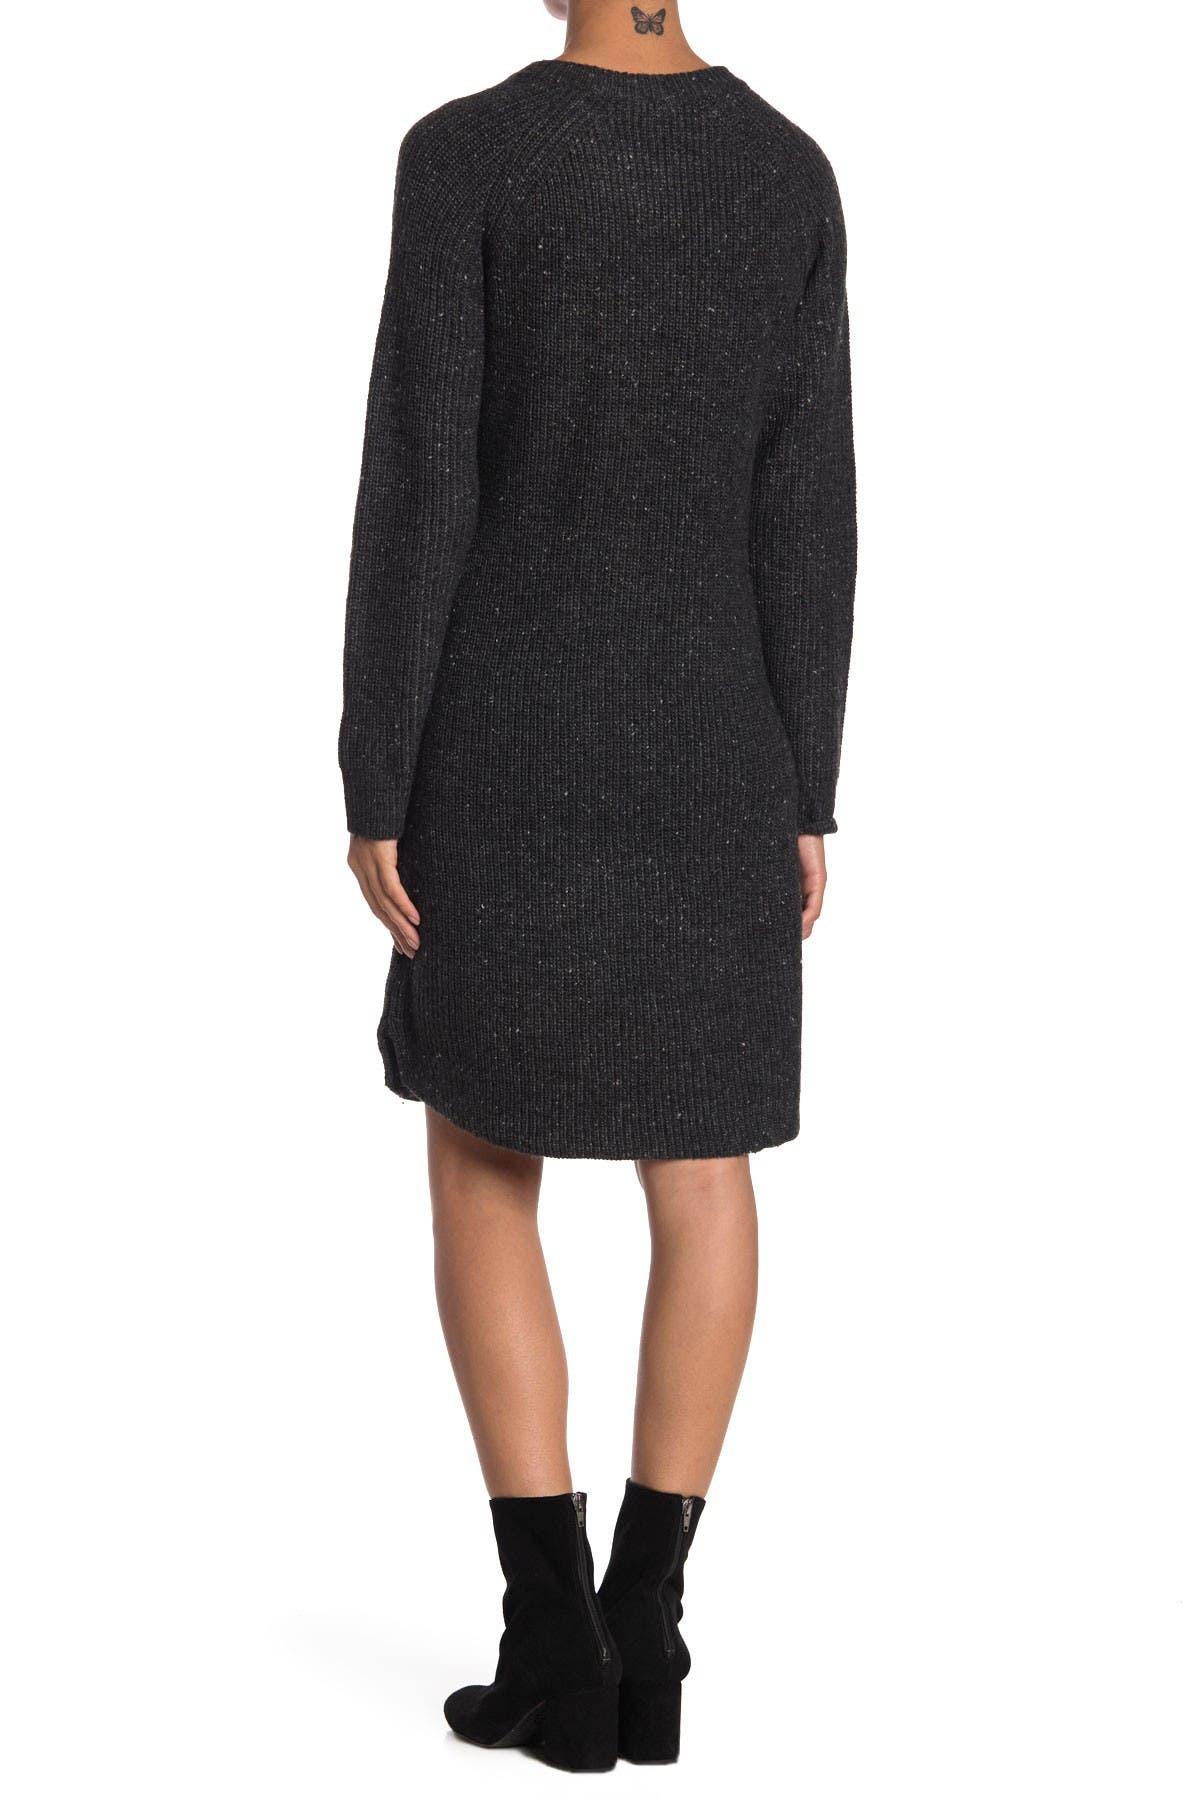 Image of Madewell Curved Hem Sweater Dress